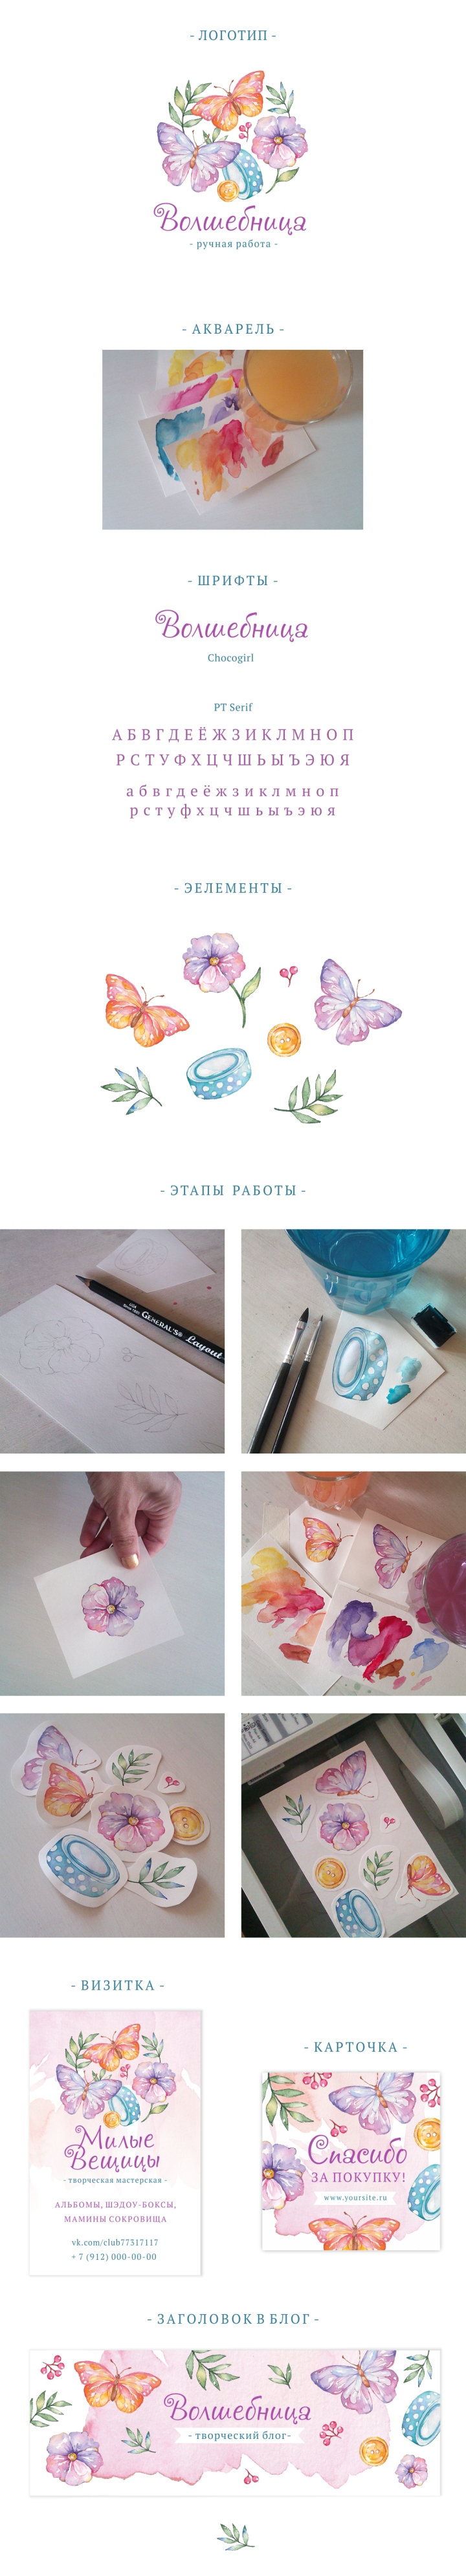 studio11-logosale_05-3